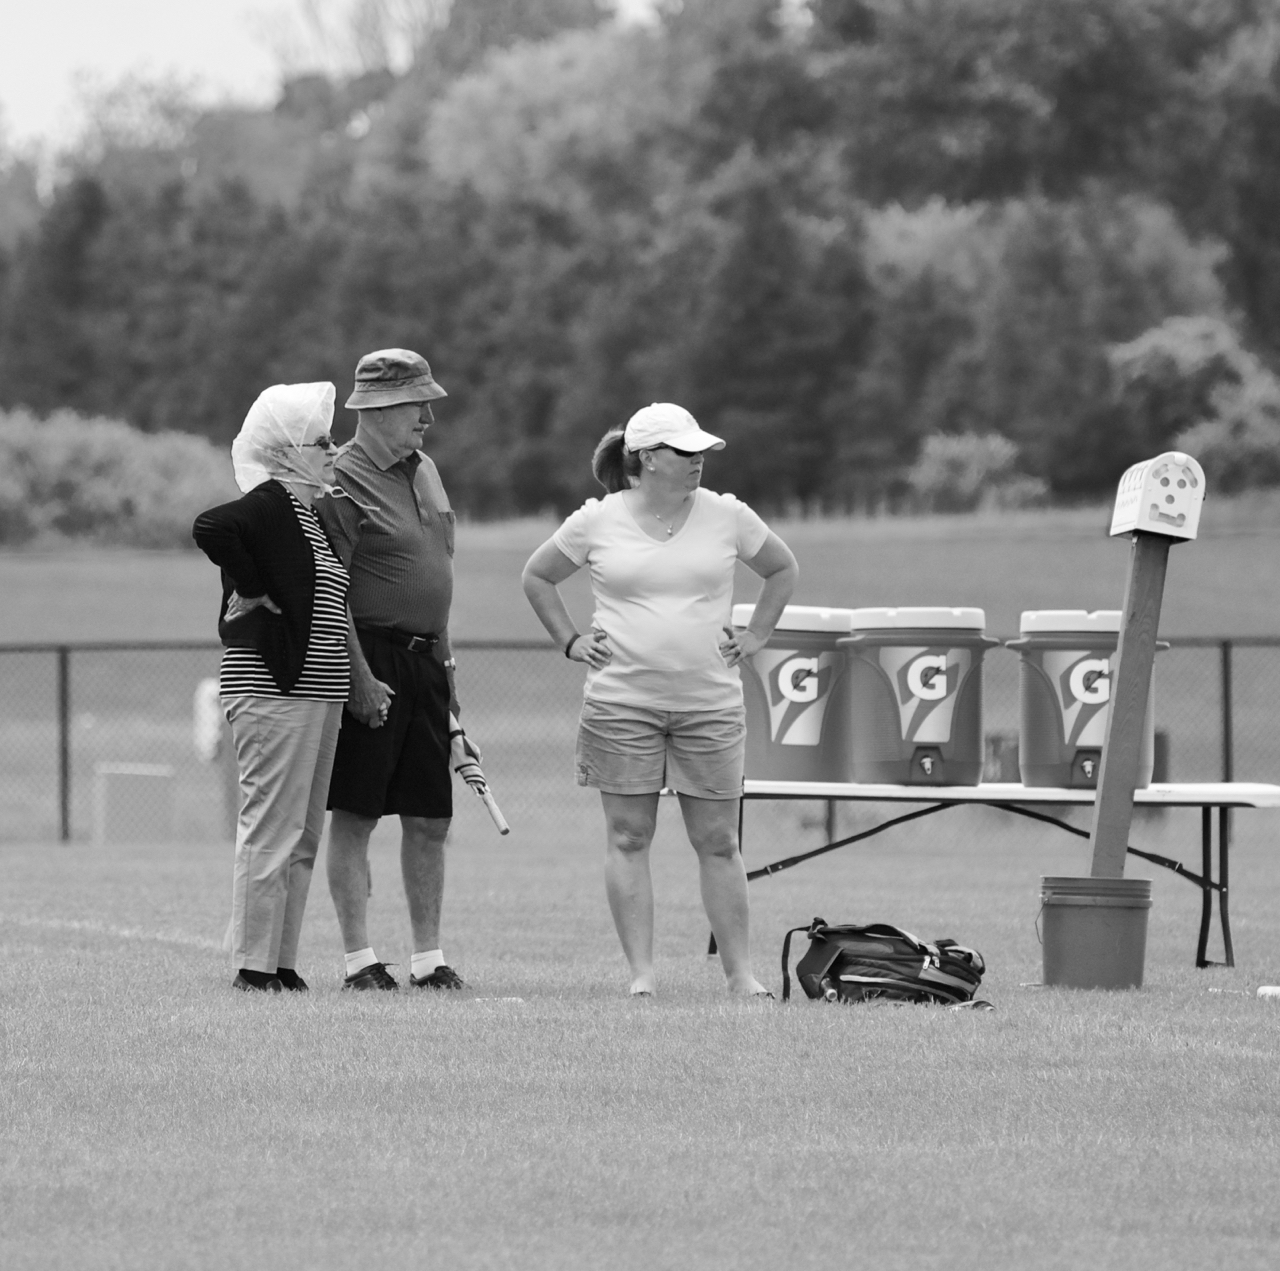 More Hats. Sportscore Two. Loves Park, Illinois. June 2017. © William D. Walker